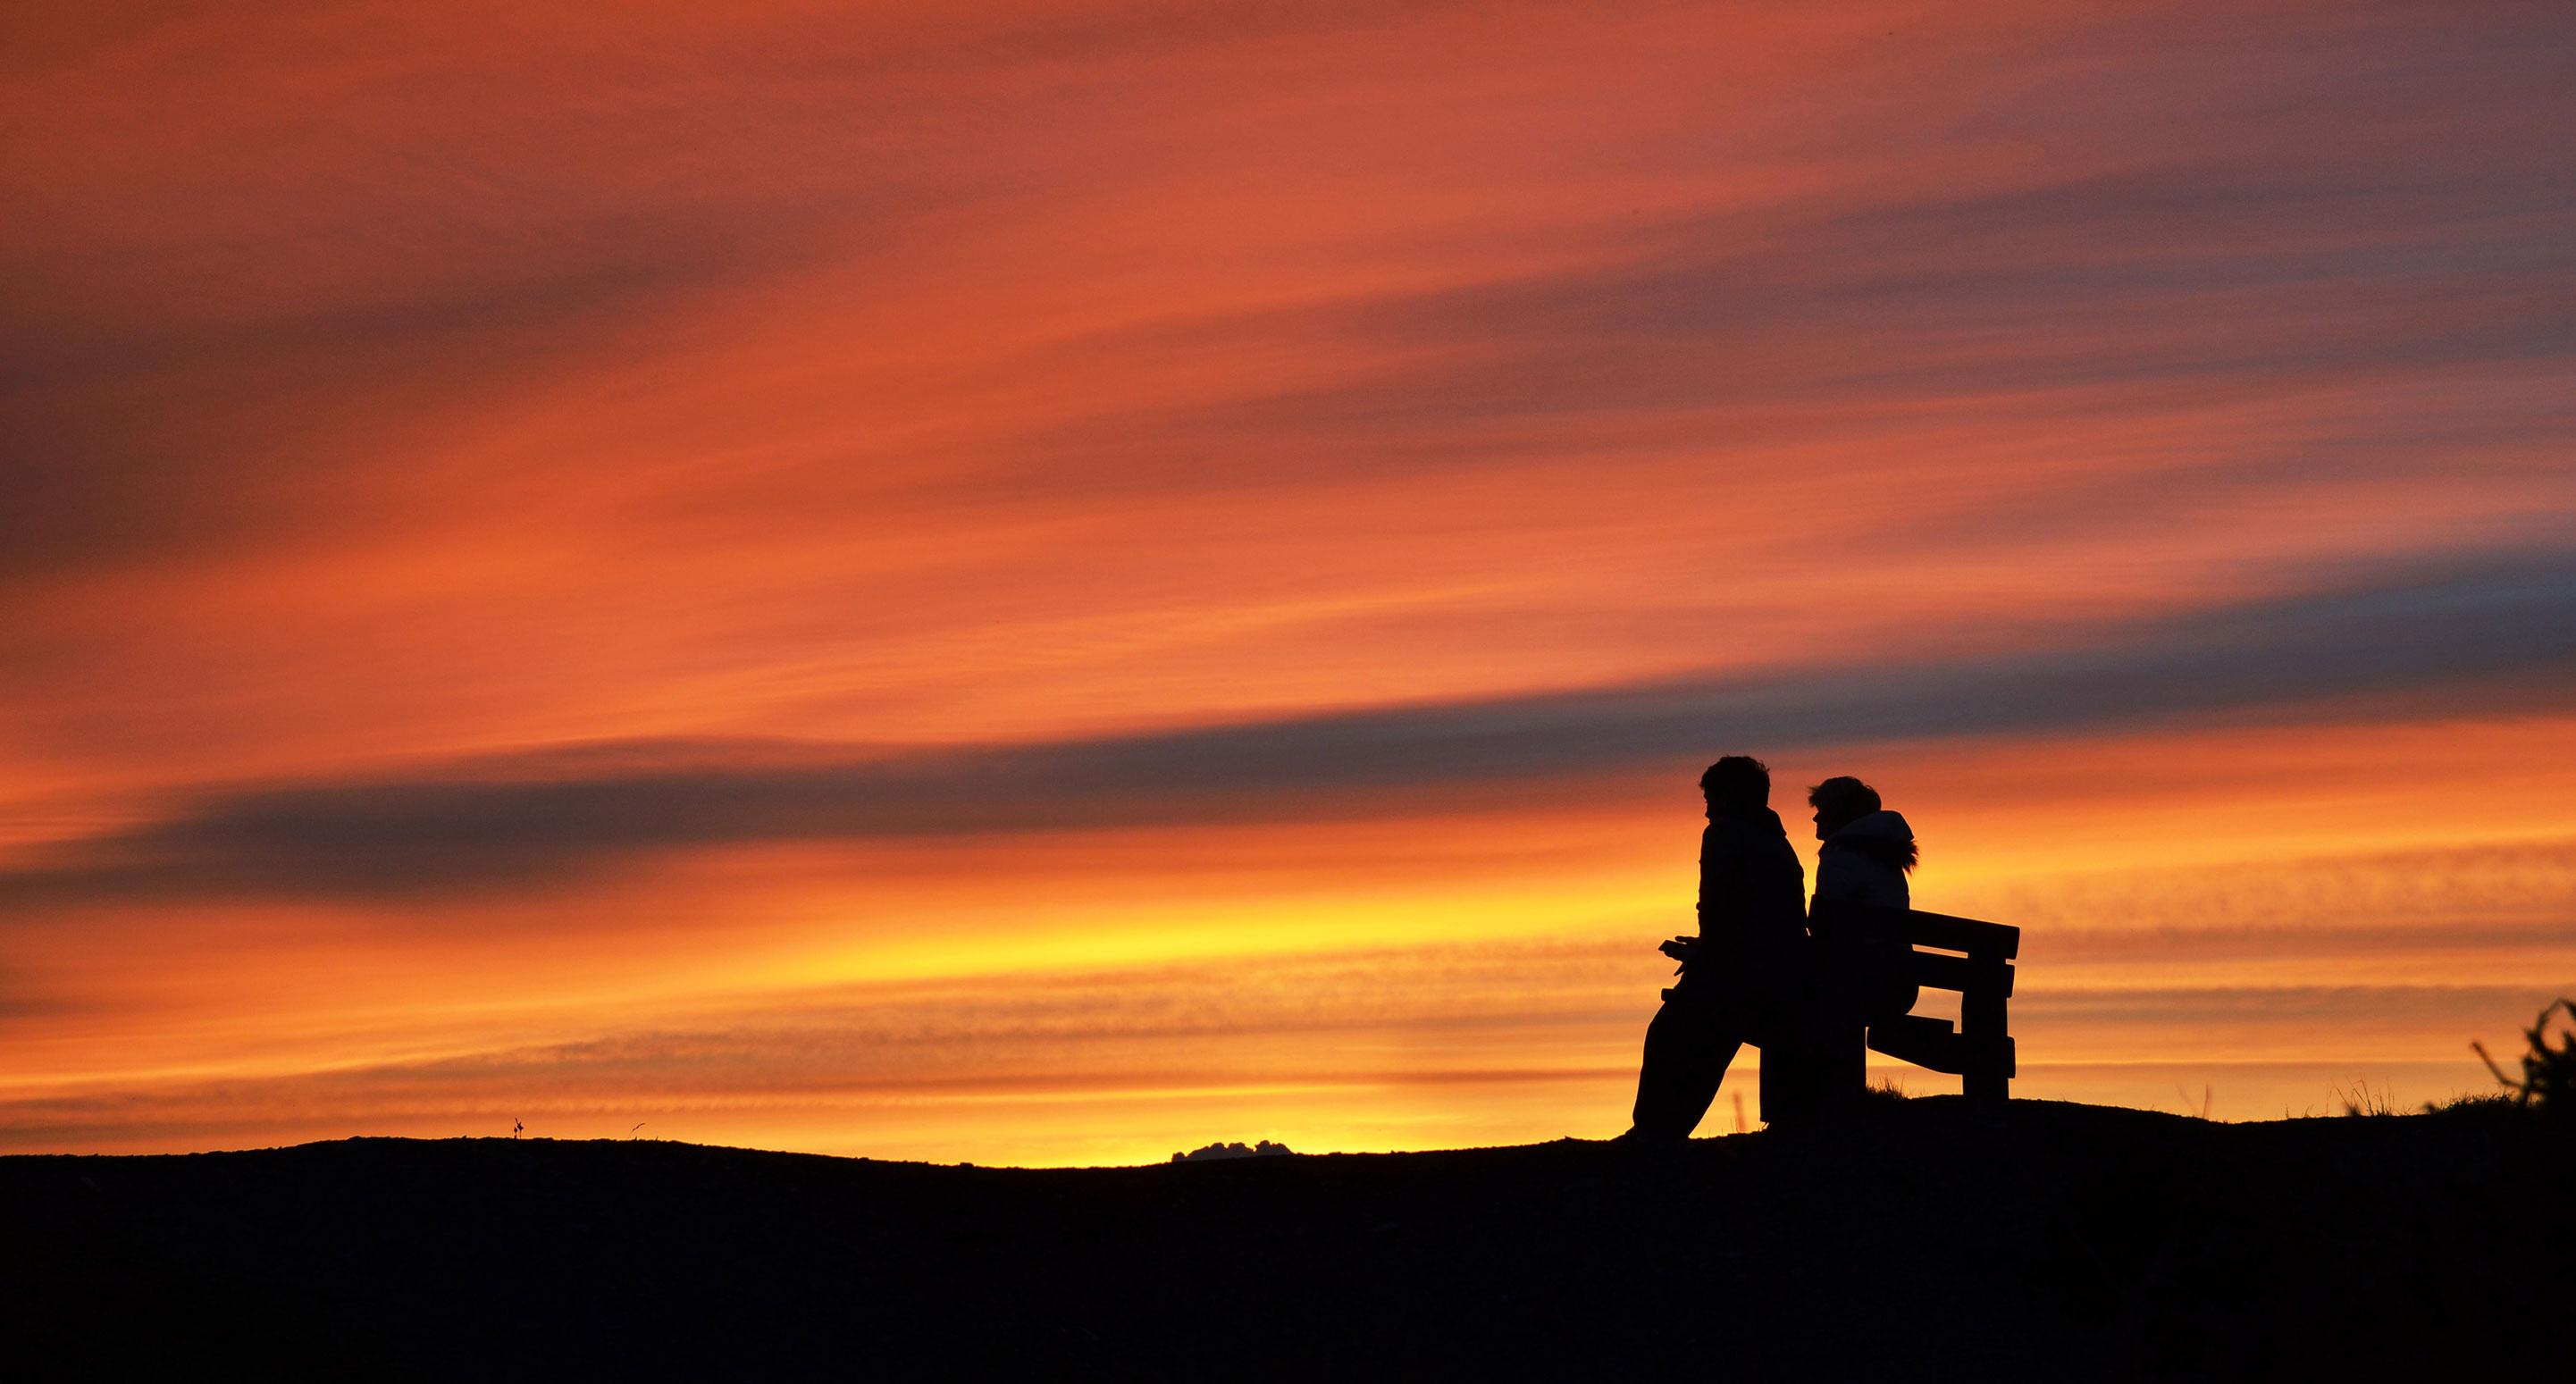 aberystwyth_sunset